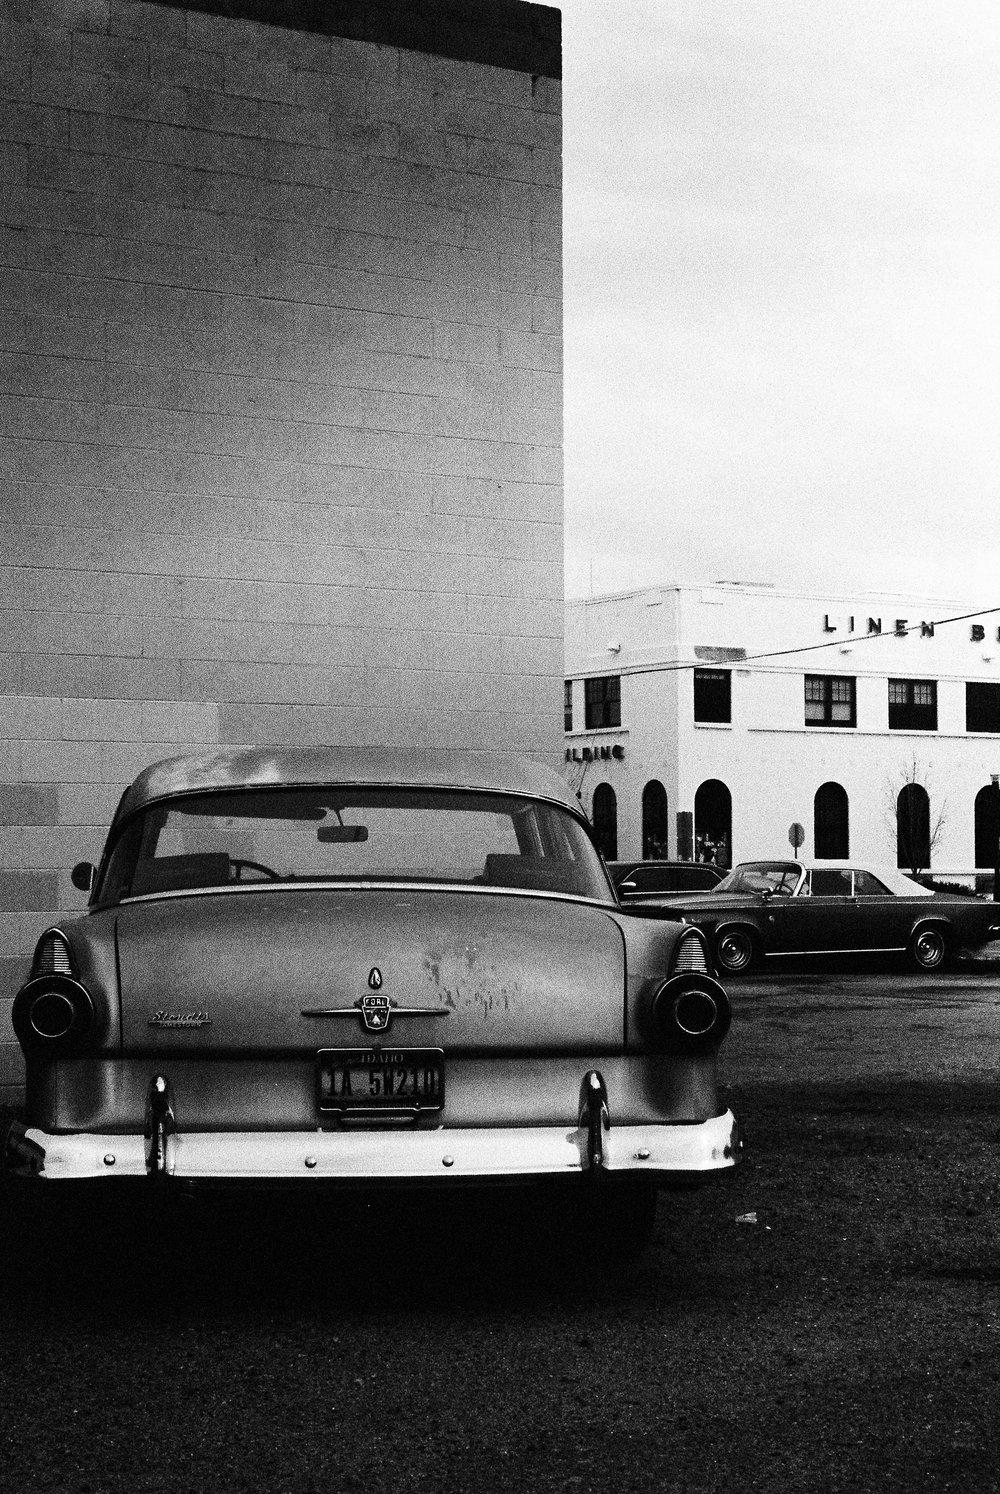 Dntn Boise Old Cars.jpg